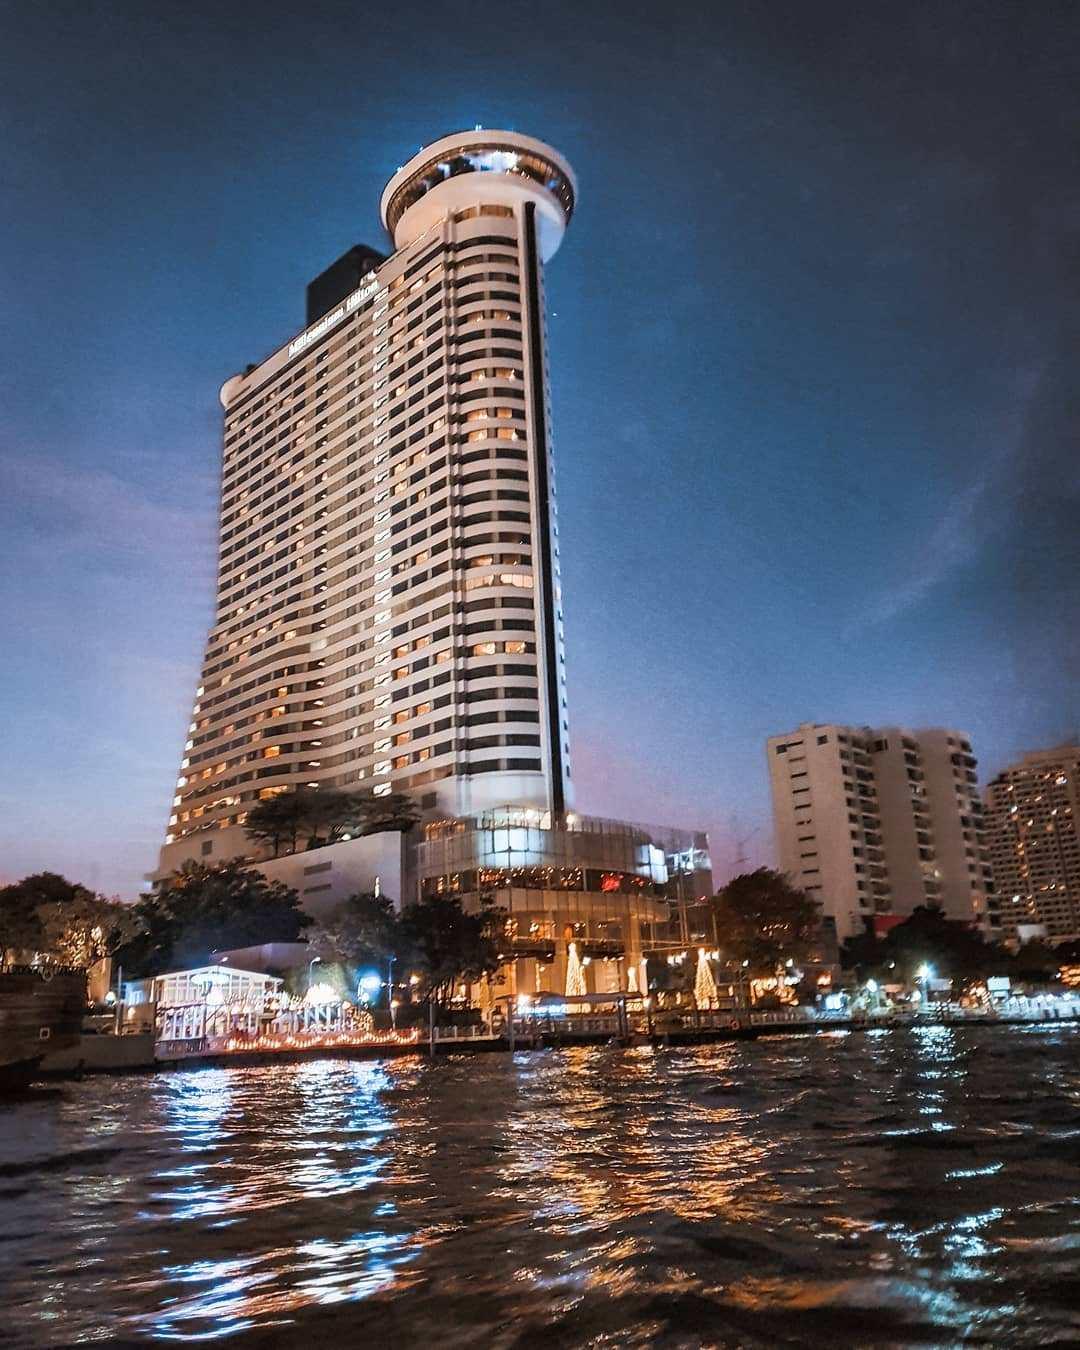 Het Millennium Hilton Bangkok langs de Chao Phraya rivier